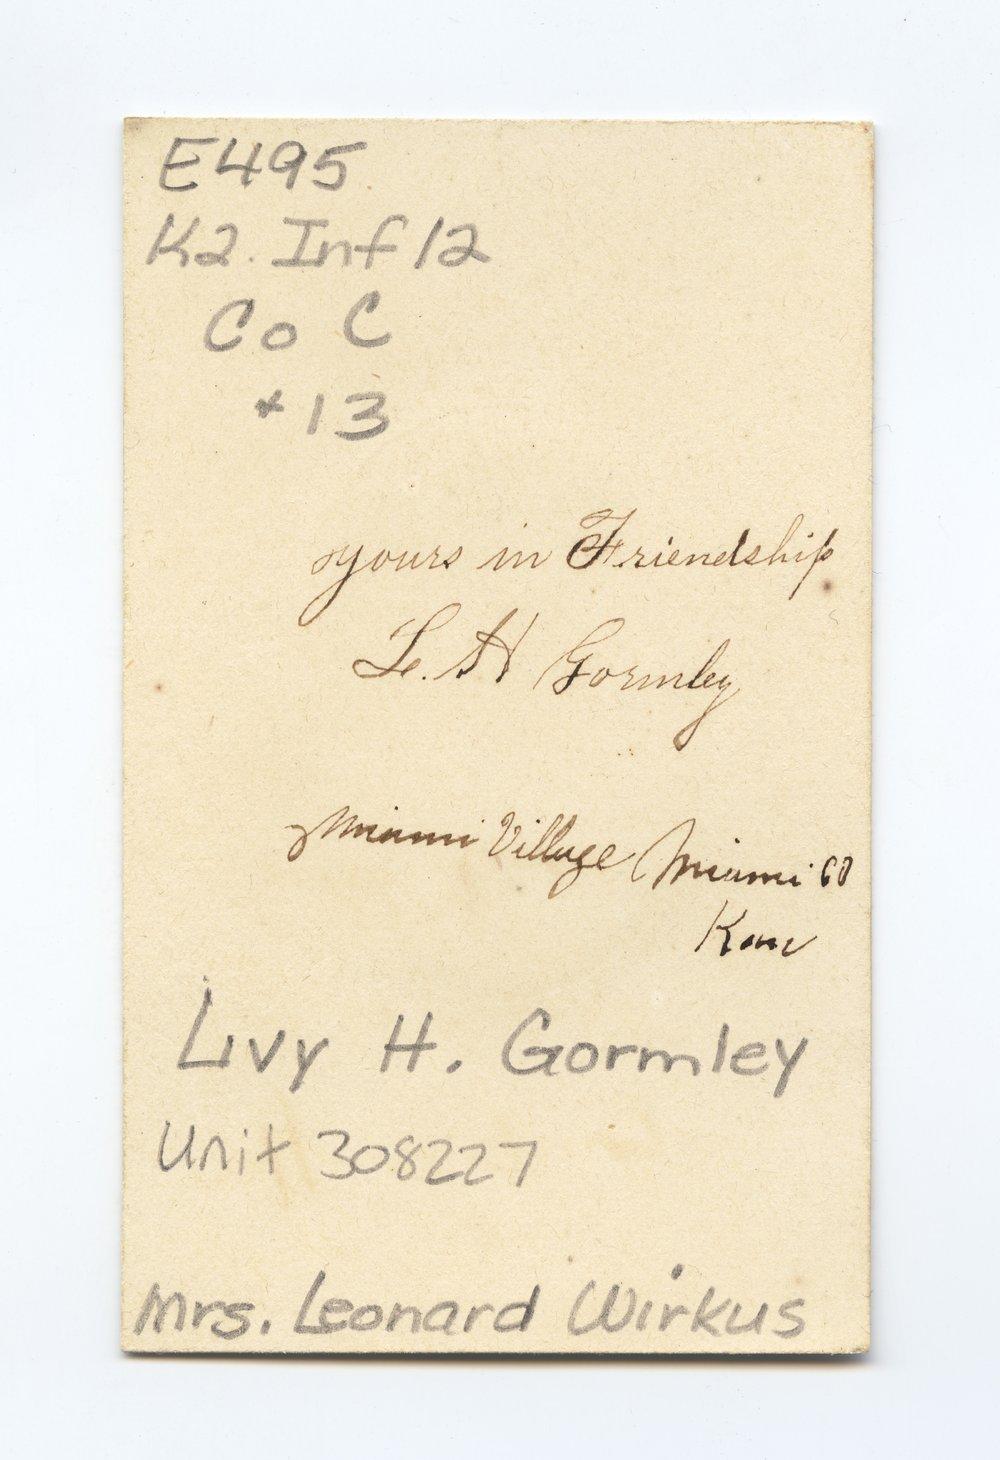 Livy H. Gormley - 2